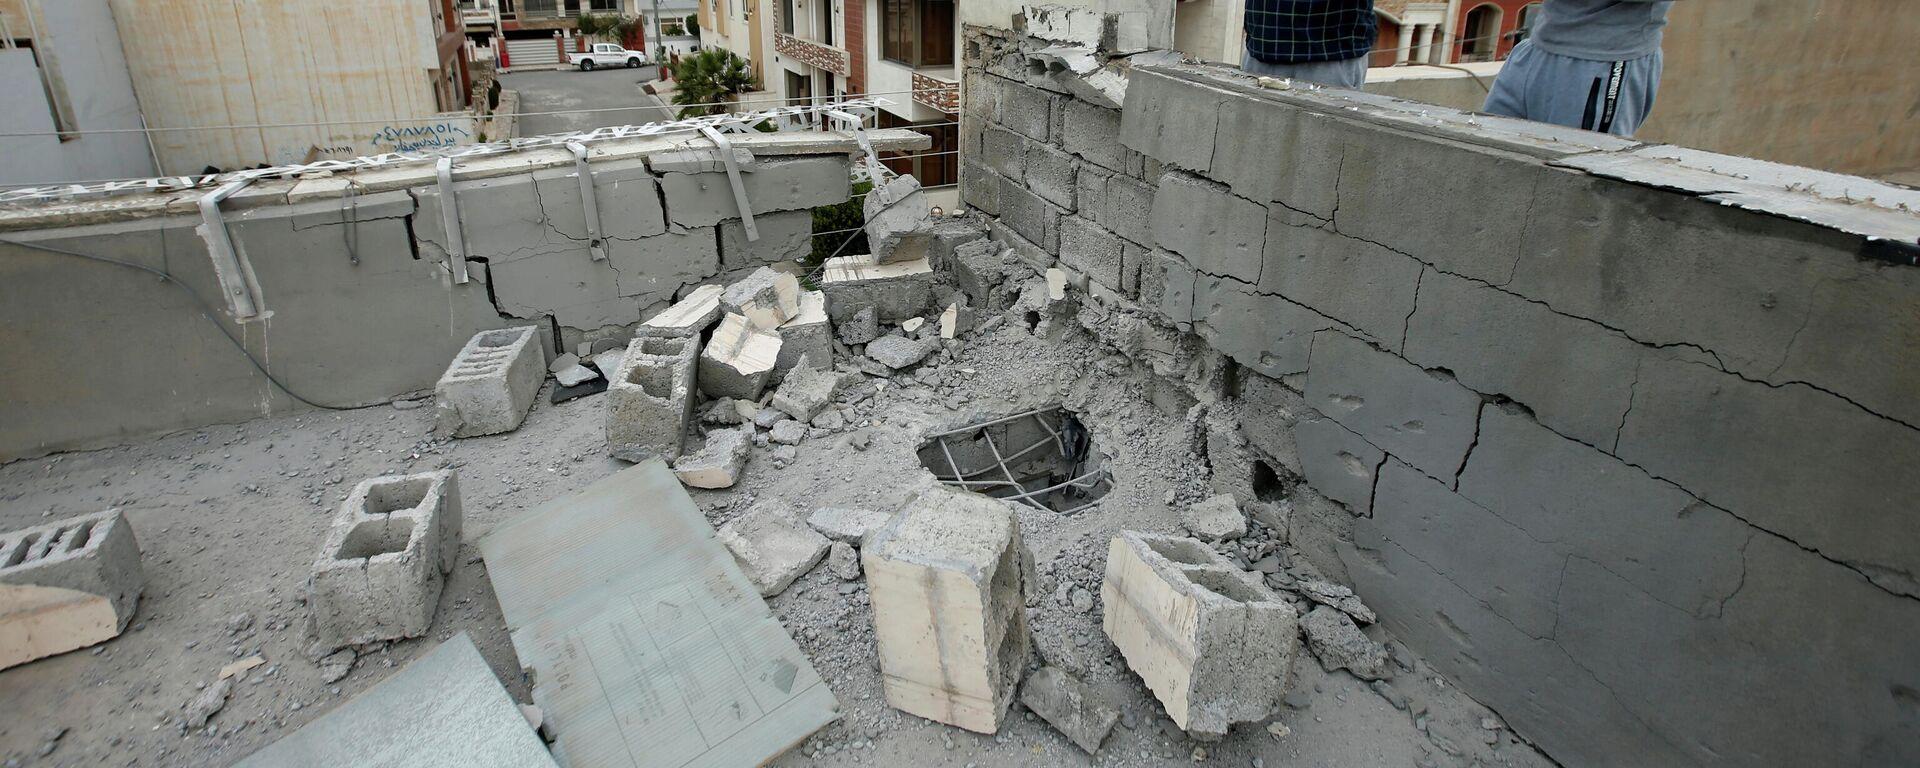 Folgen eines Raketenangriffs in Erbil, Irak - SNA, 1920, 17.02.2021